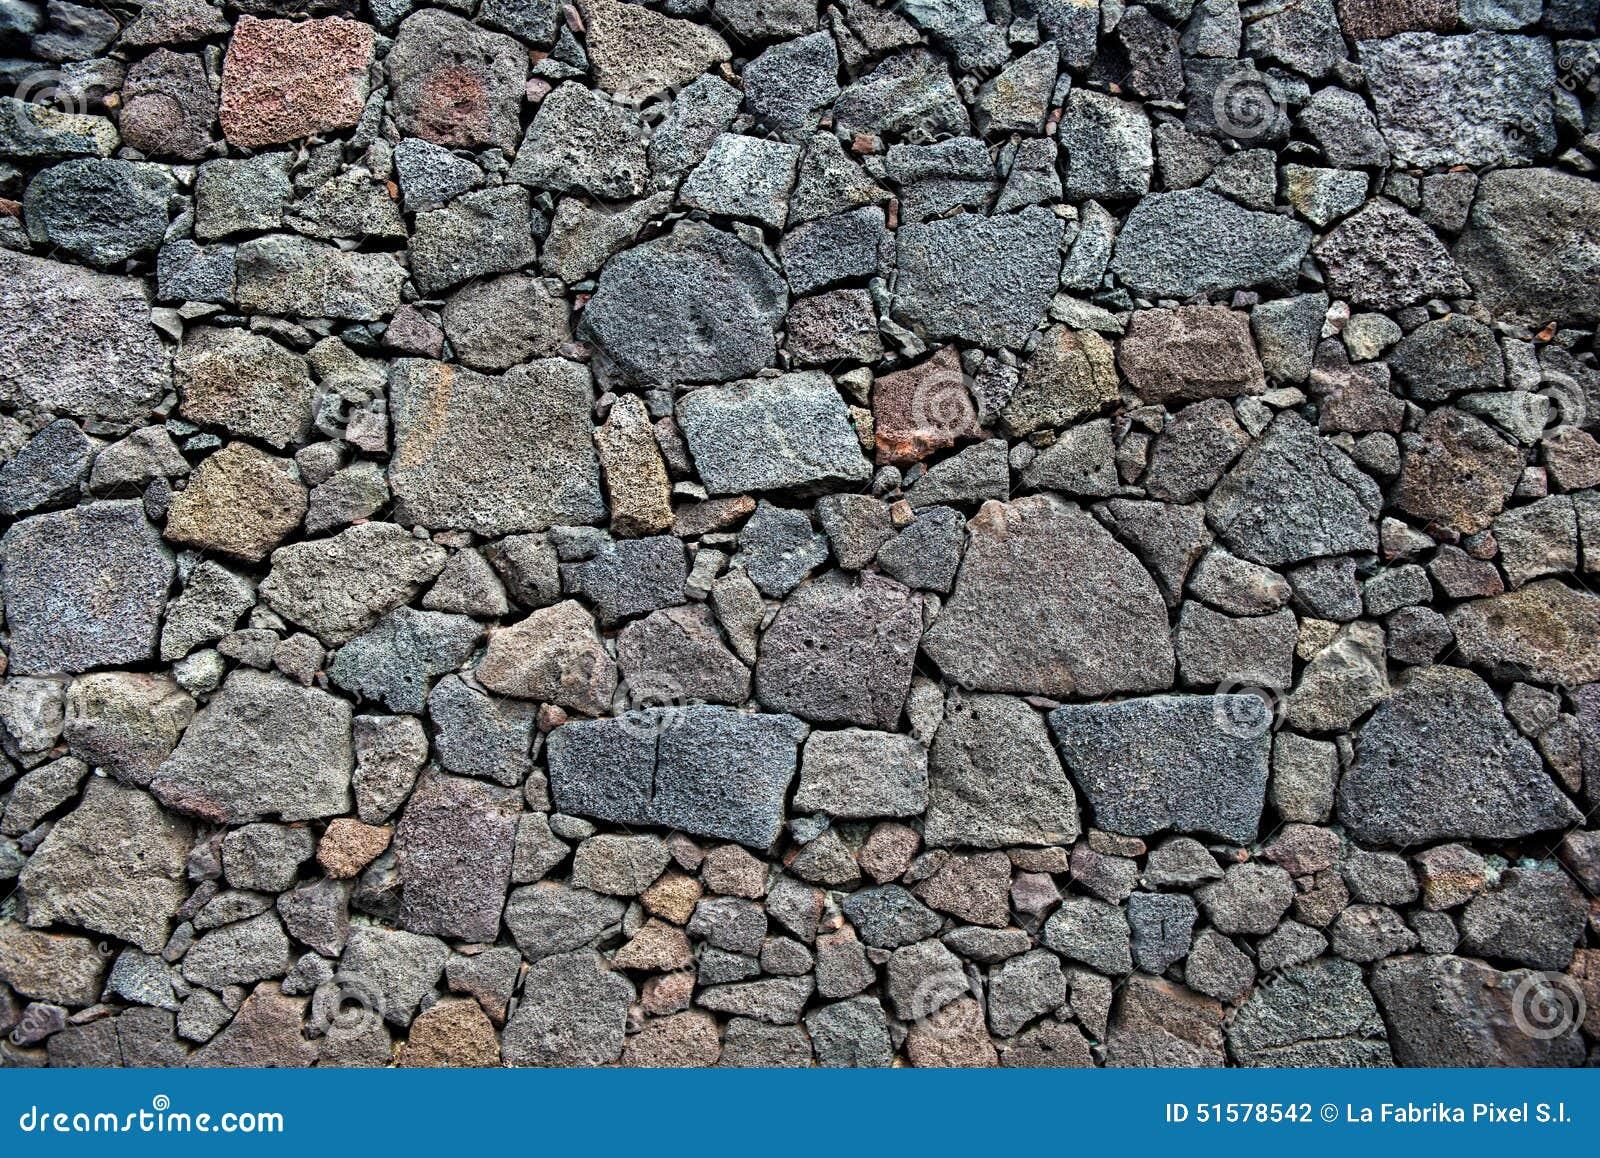 Cracked Lava Rock Texture Stock Photo - Image: 51578542